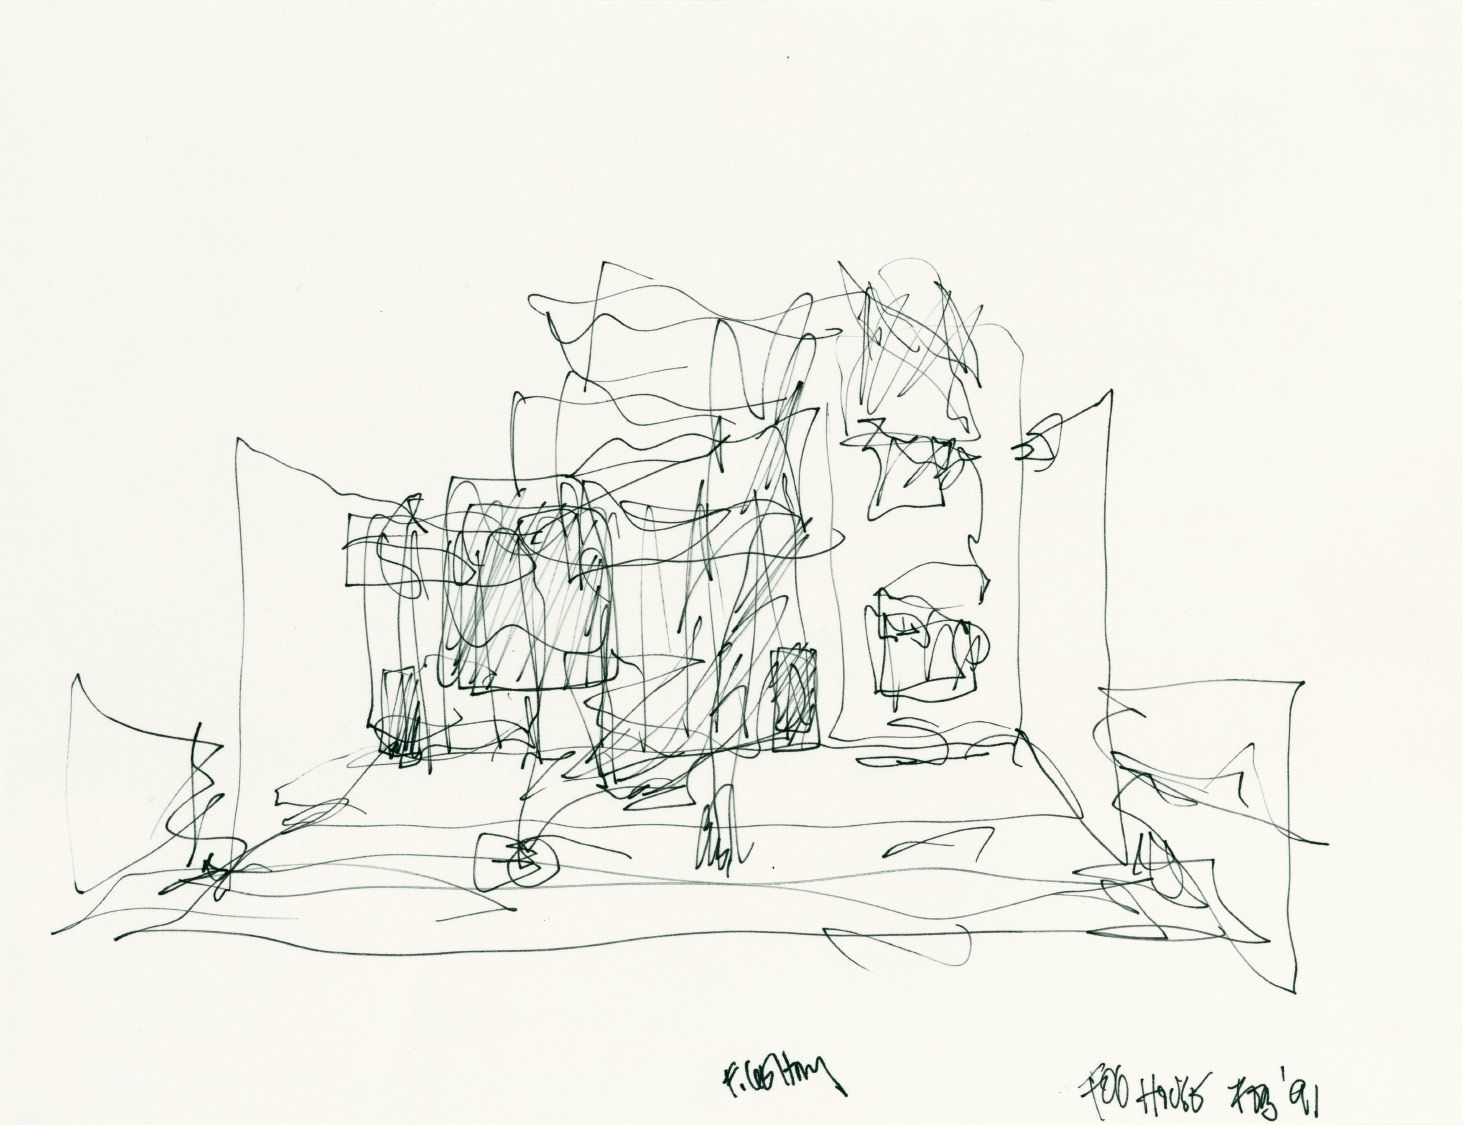 frank gehry u0026 39 s sketch of gehry residence  santa monica